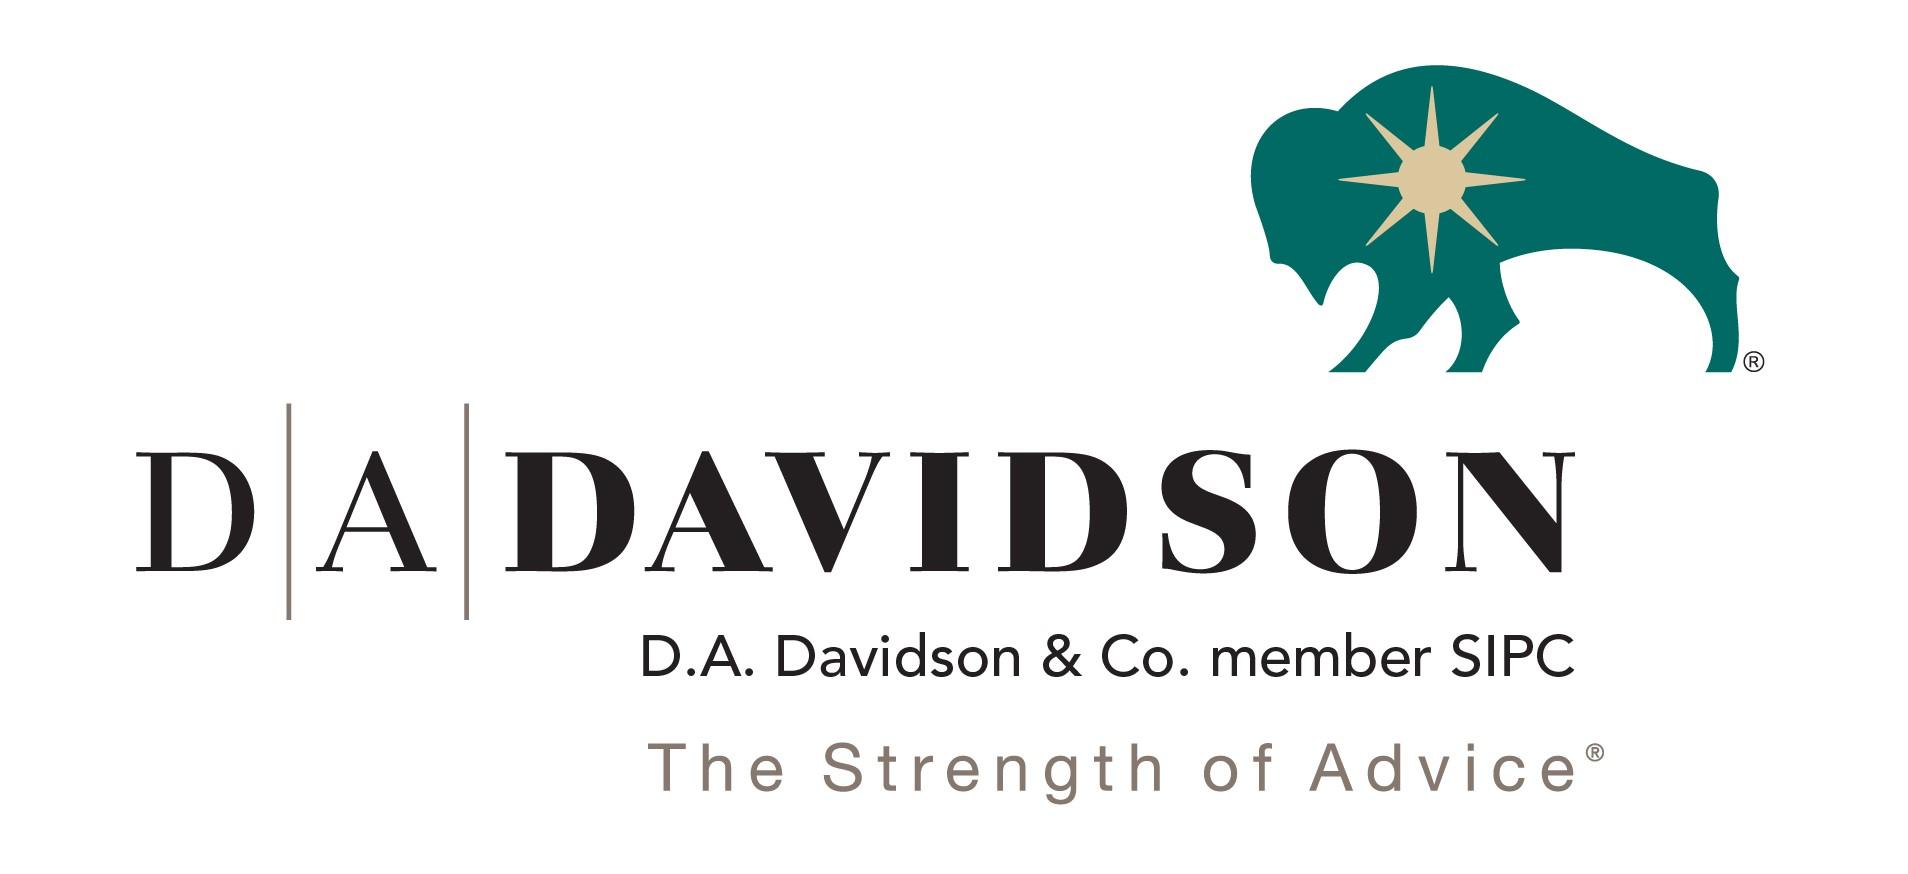 https://secureservercdn.net/198.71.233.47/29f.ffb.myftpupload.com/wp-content/uploads/2016/10/DA-Davidson-logo.jpg